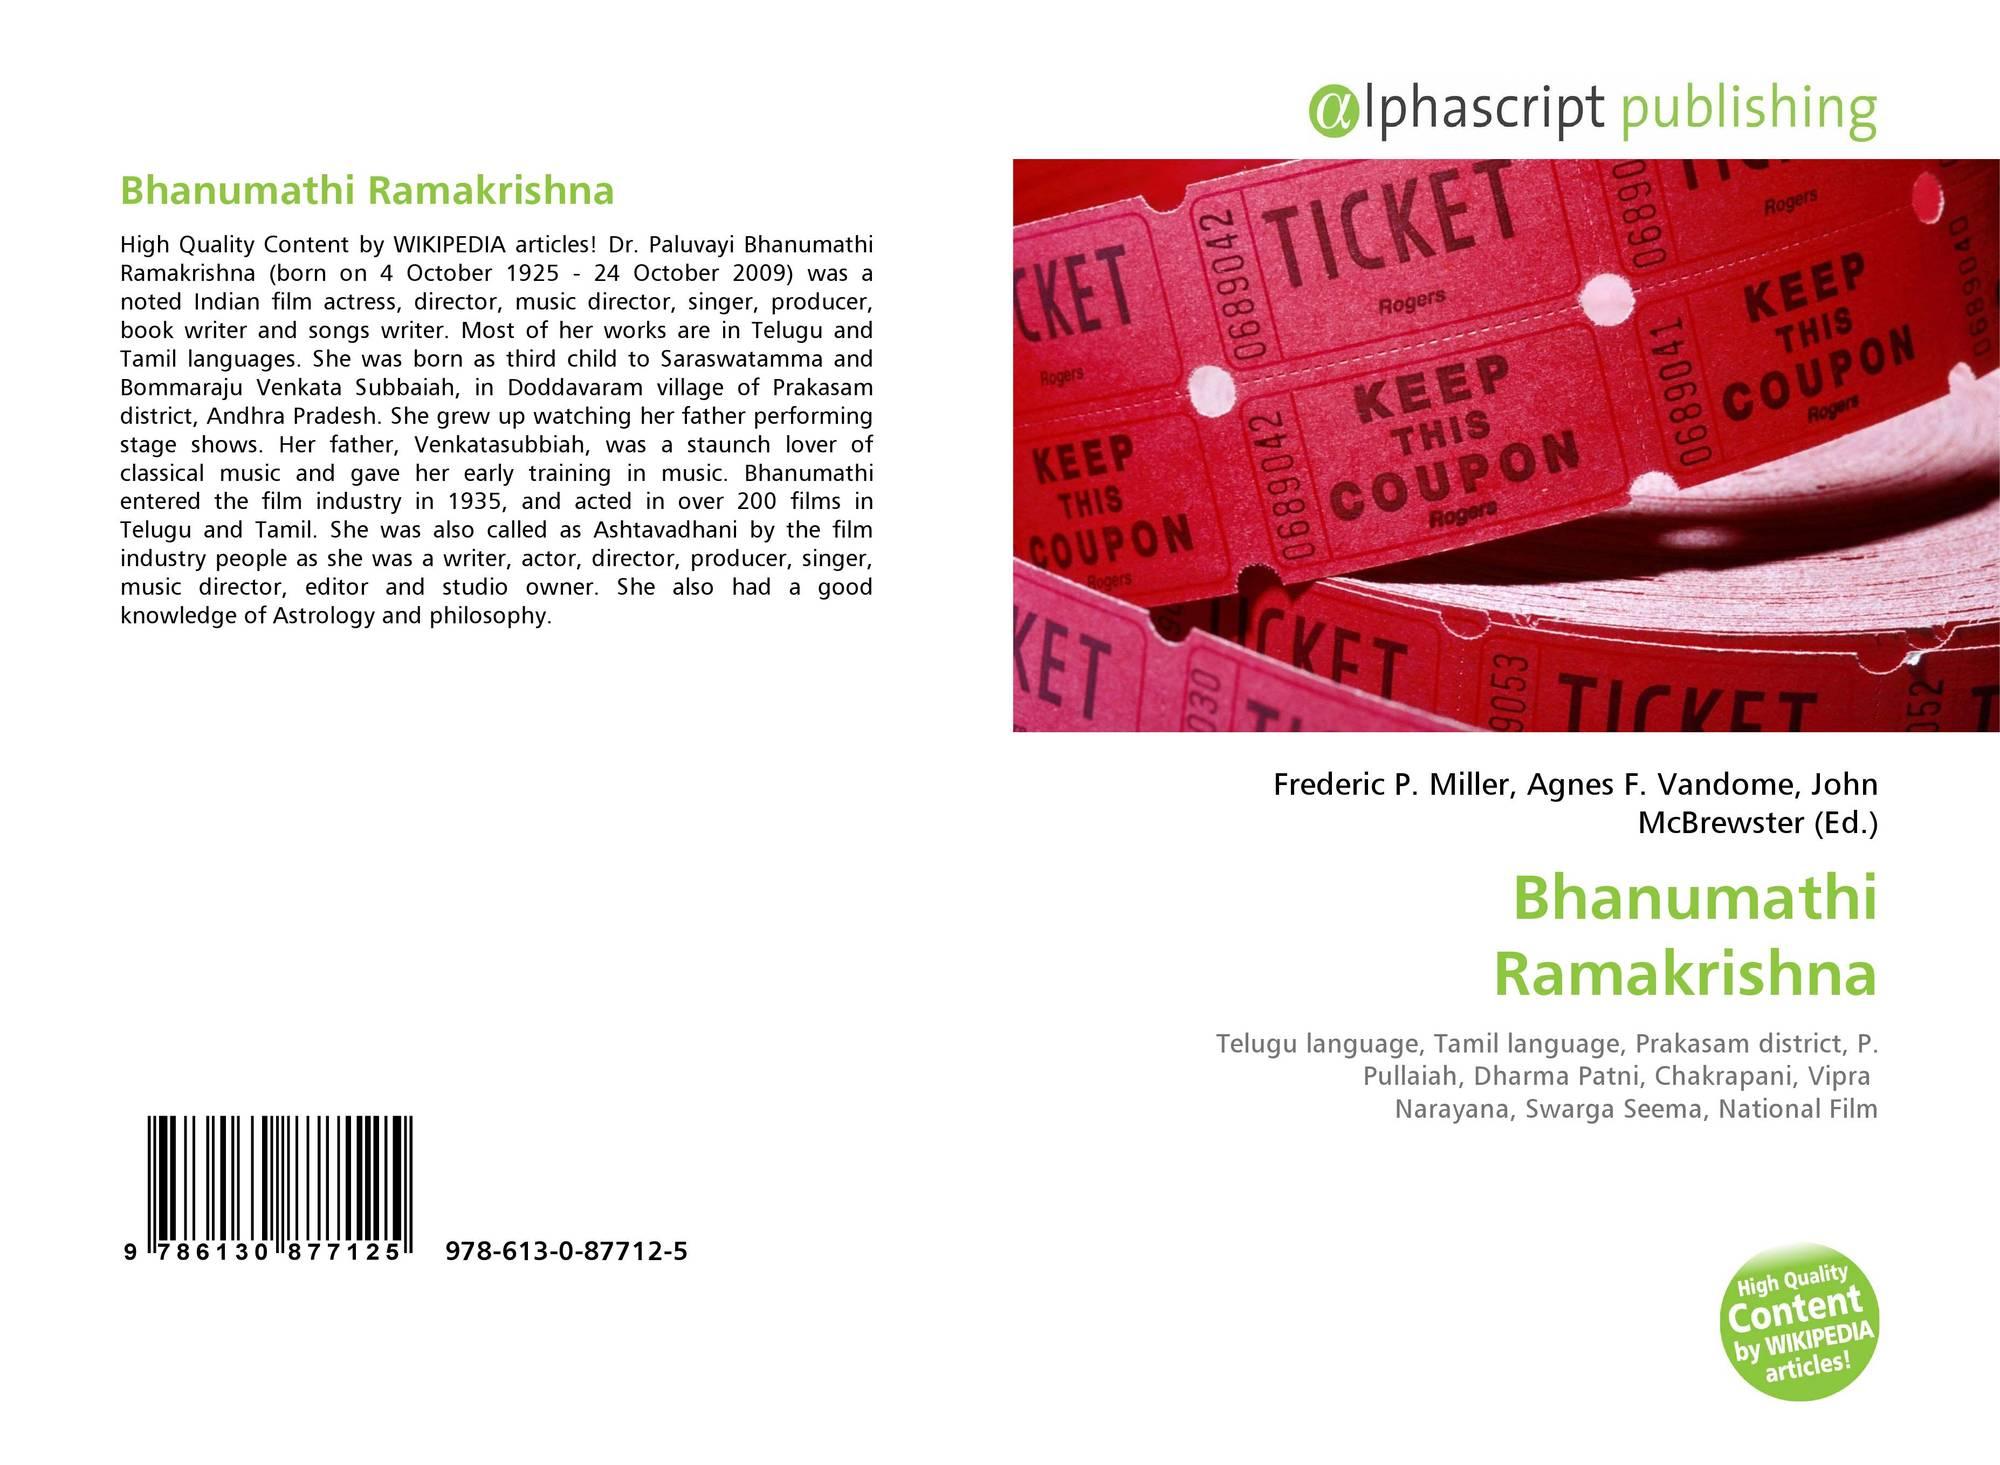 Communication on this topic: Shanelle Workman, peta-doodson/